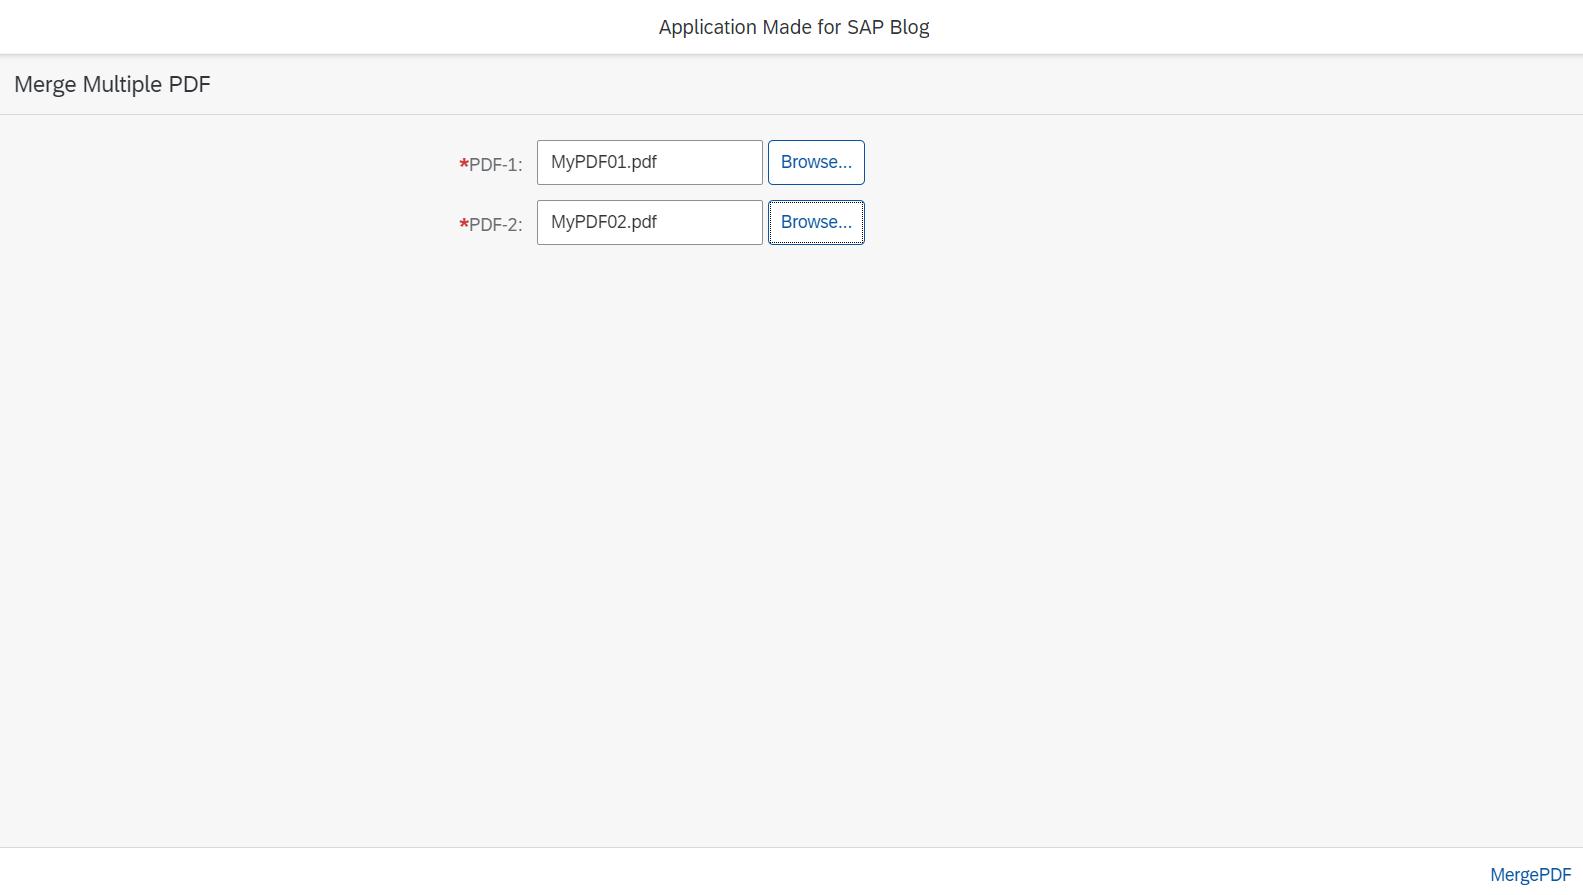 Merge PDFs using JAVA on SAP Cloud Platform | SAP Blogs